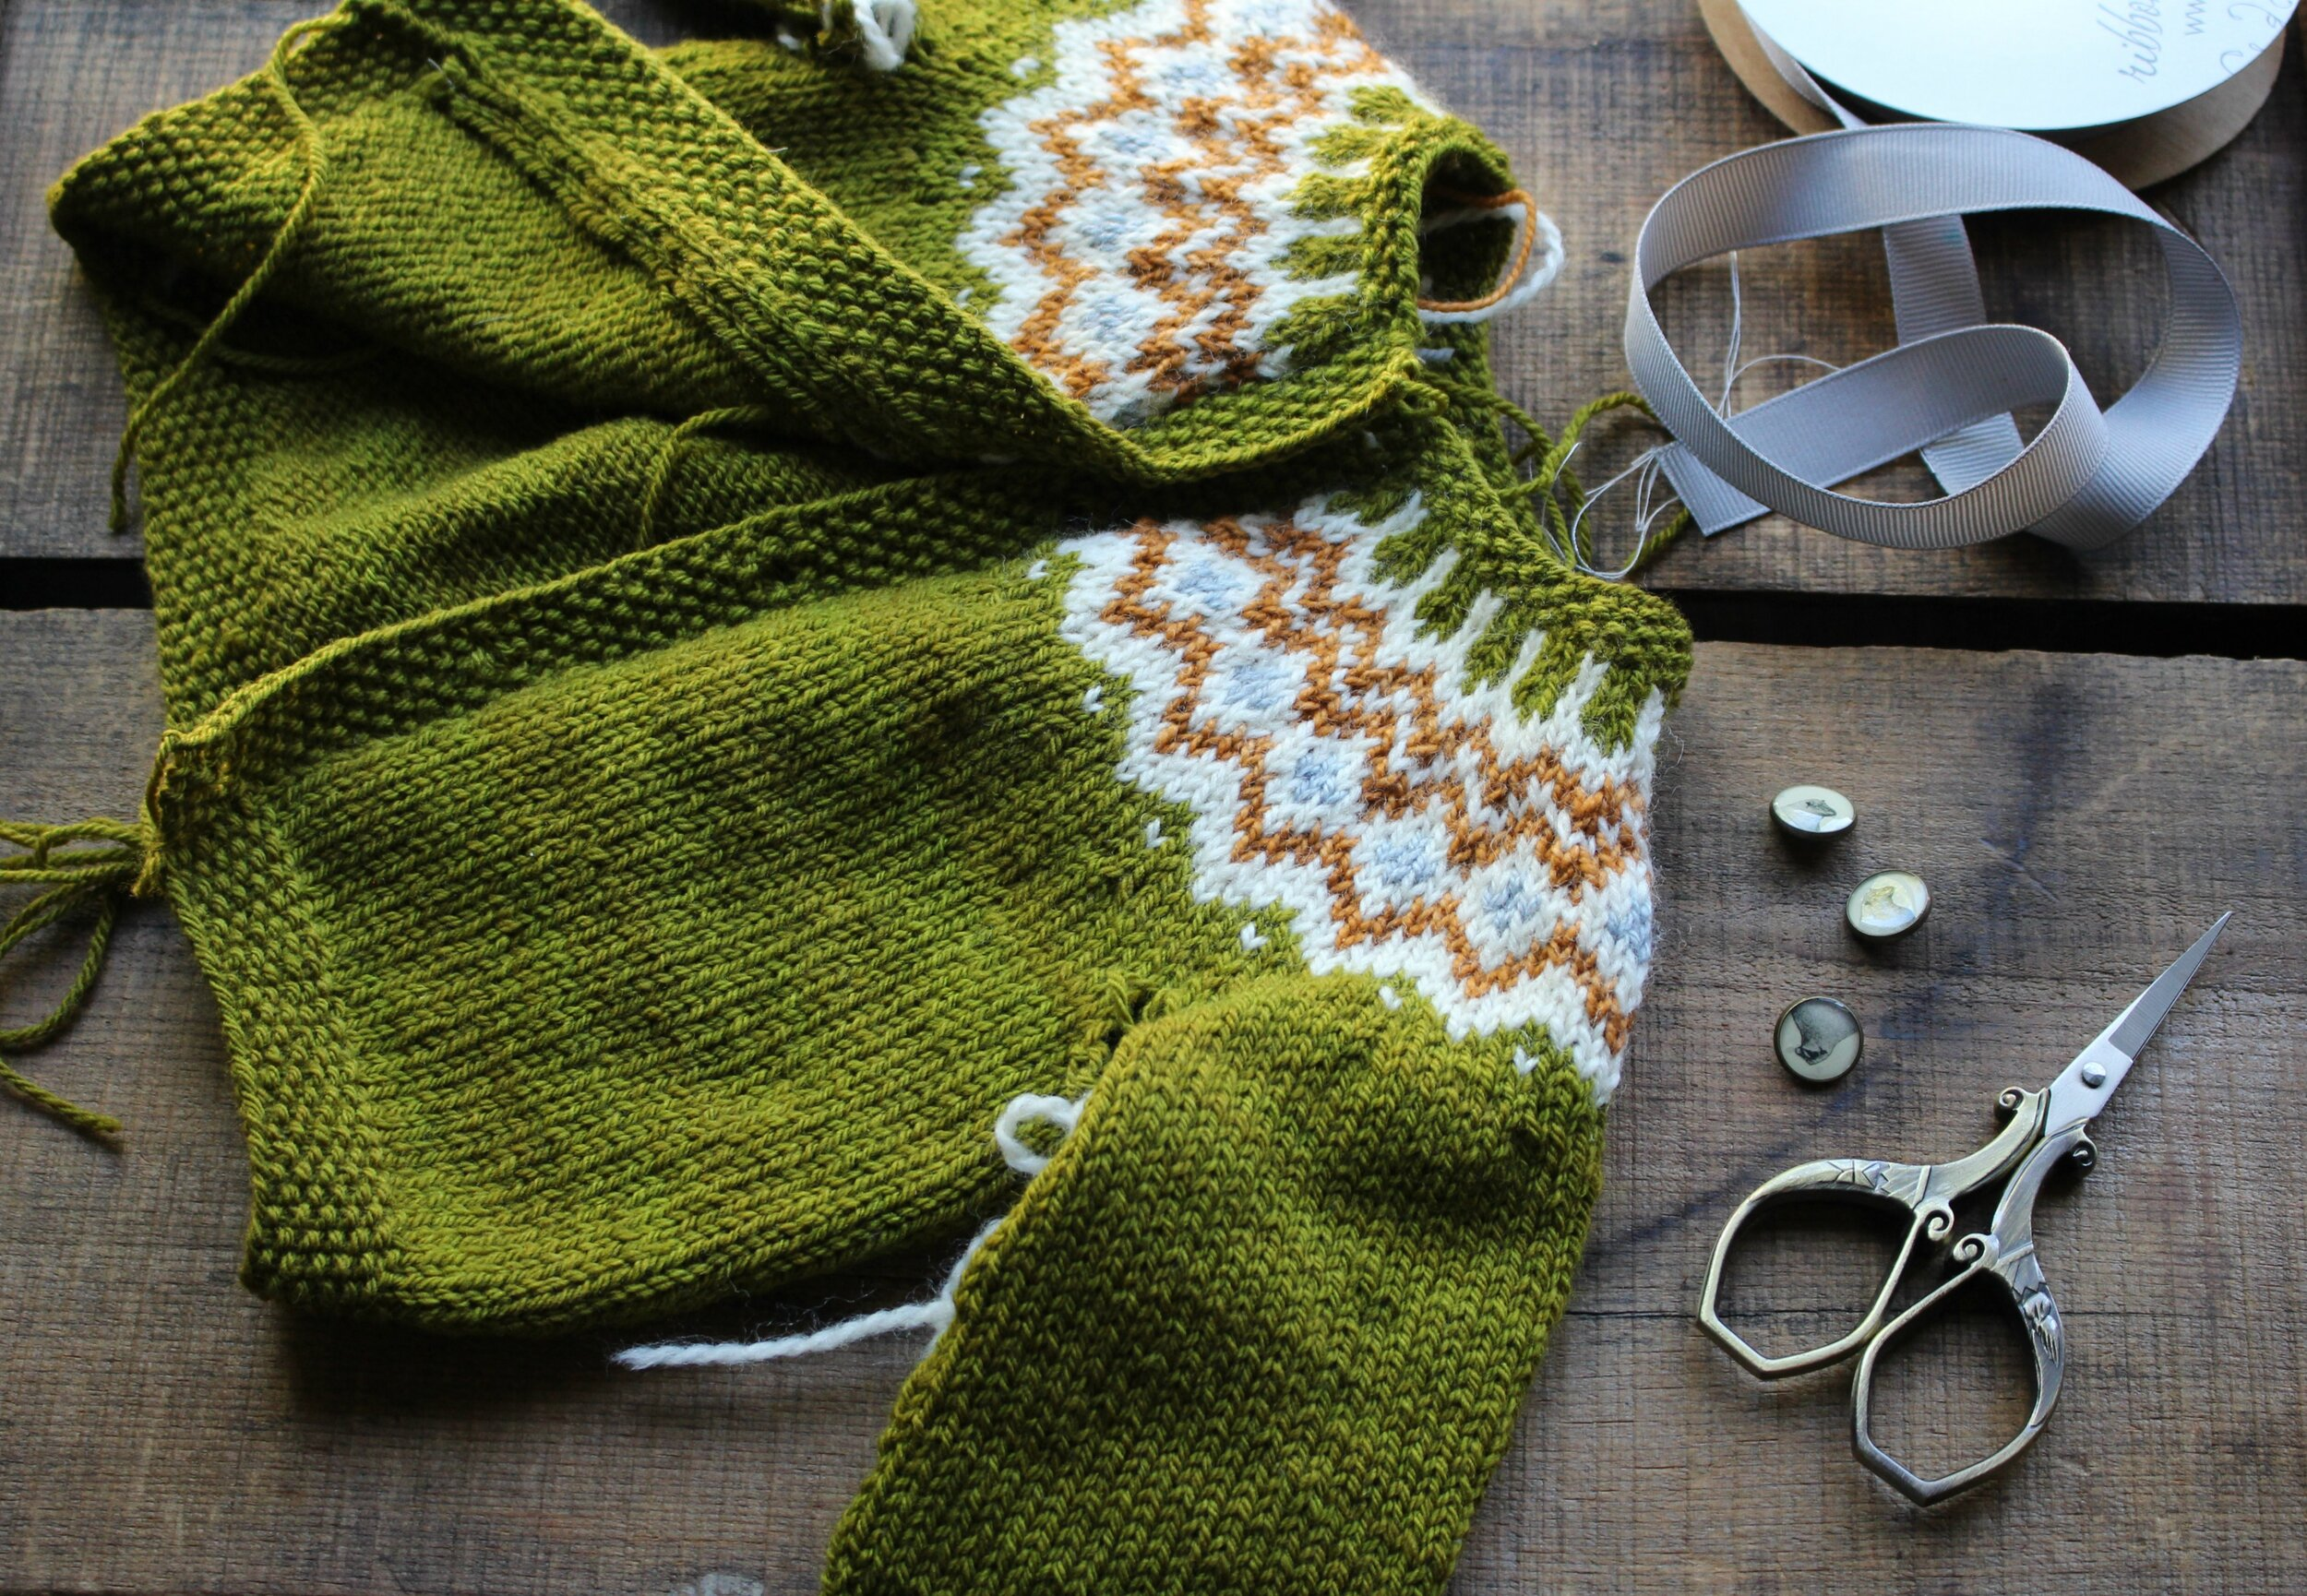 Colorwork Sweater 1.jpg